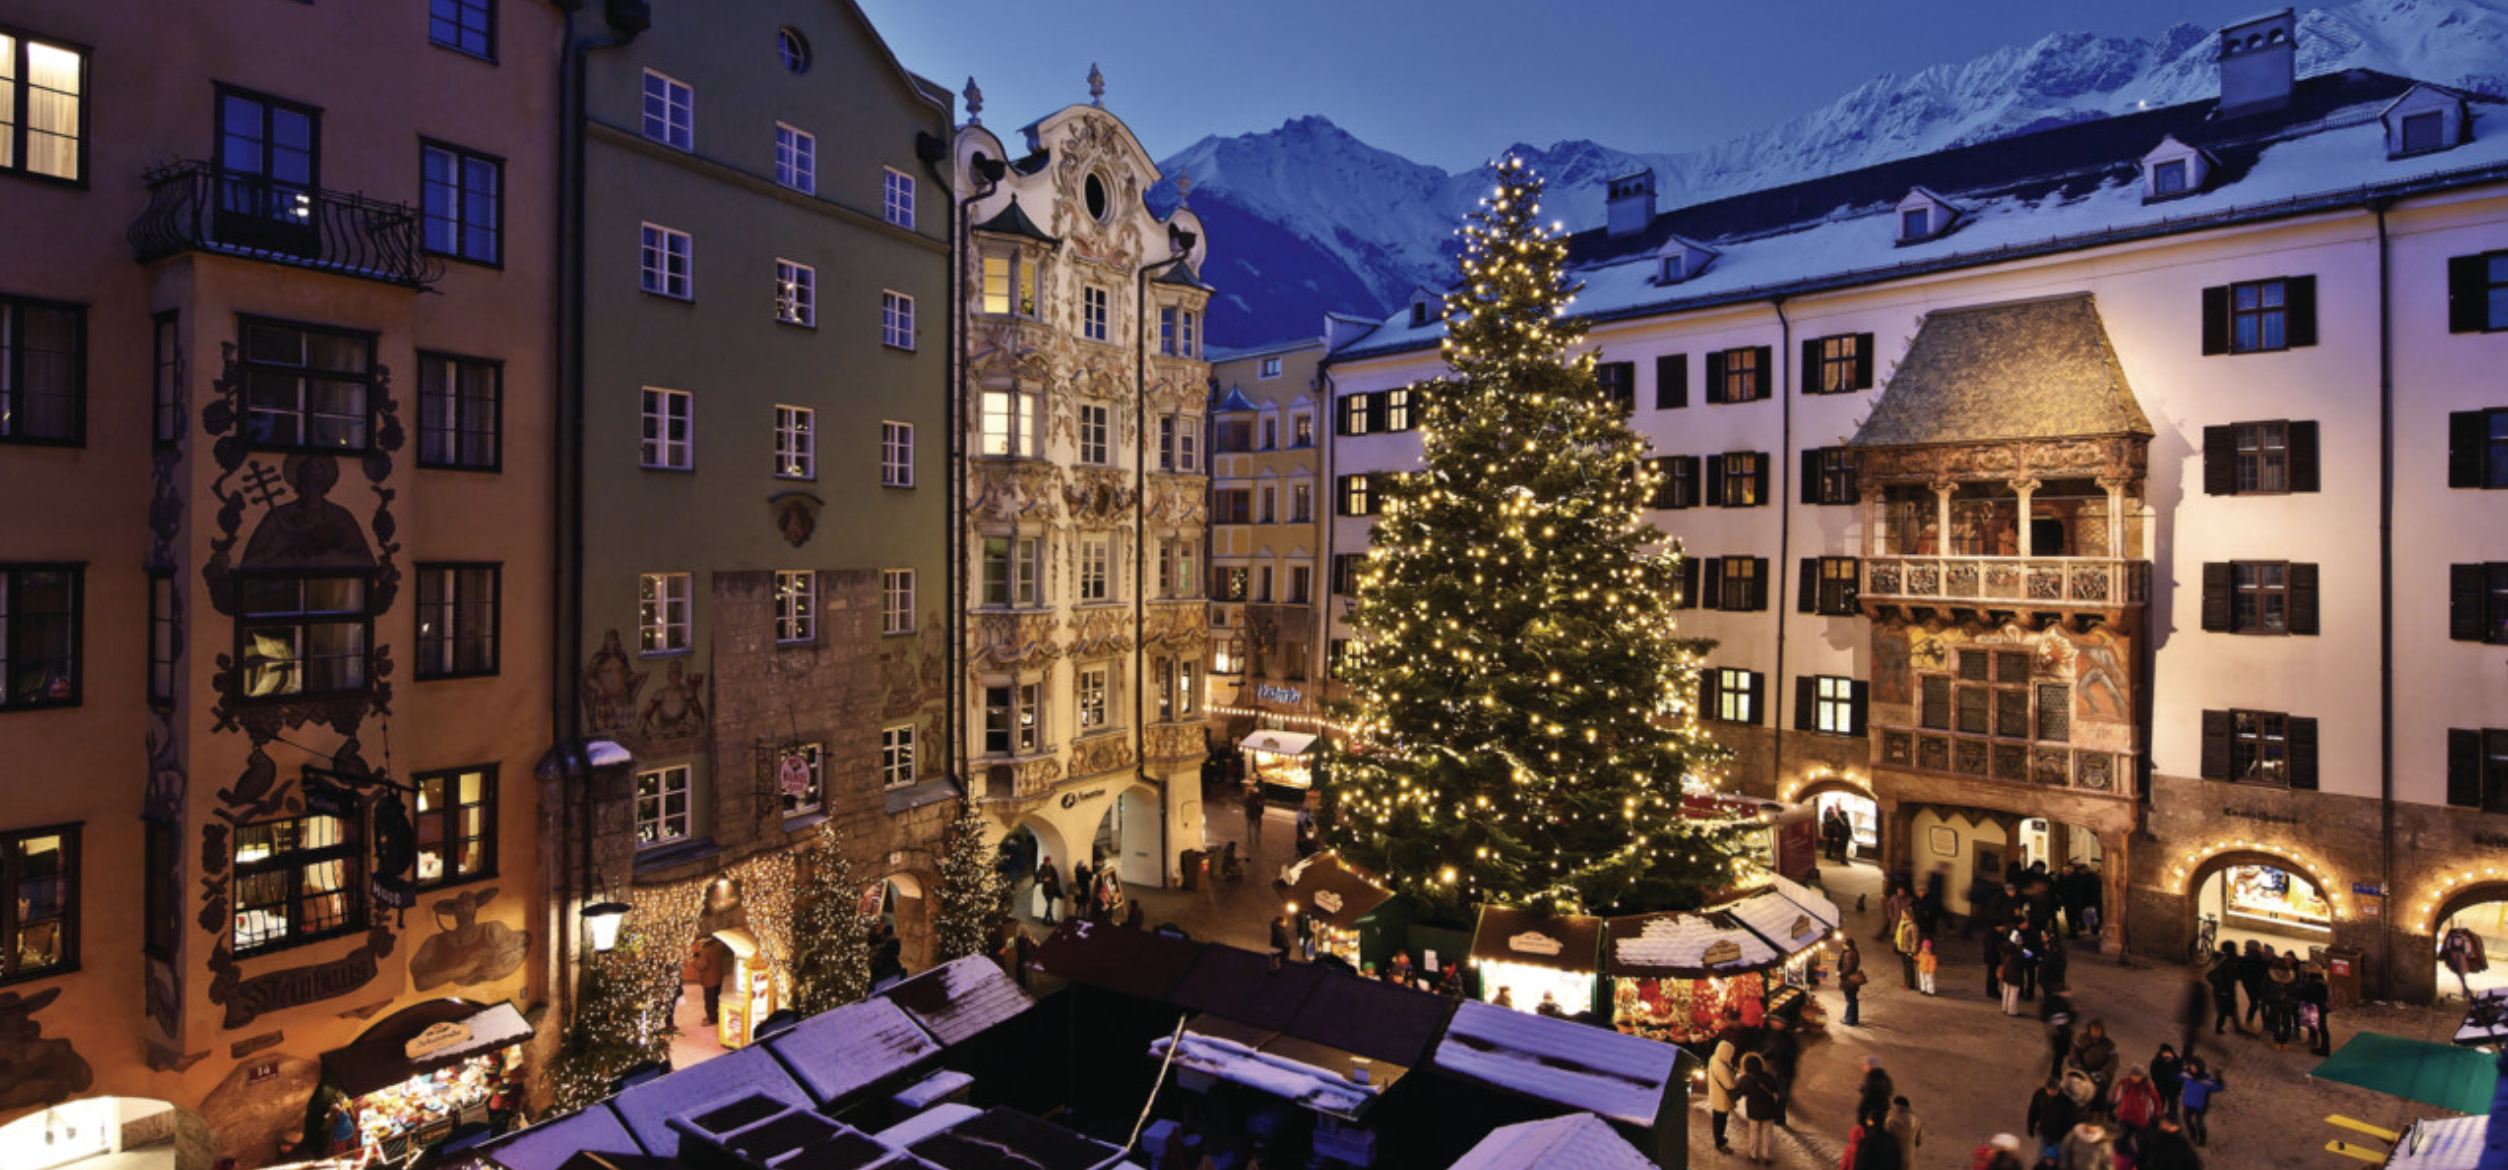 Mercado de Navidad Innsbruck. Austria